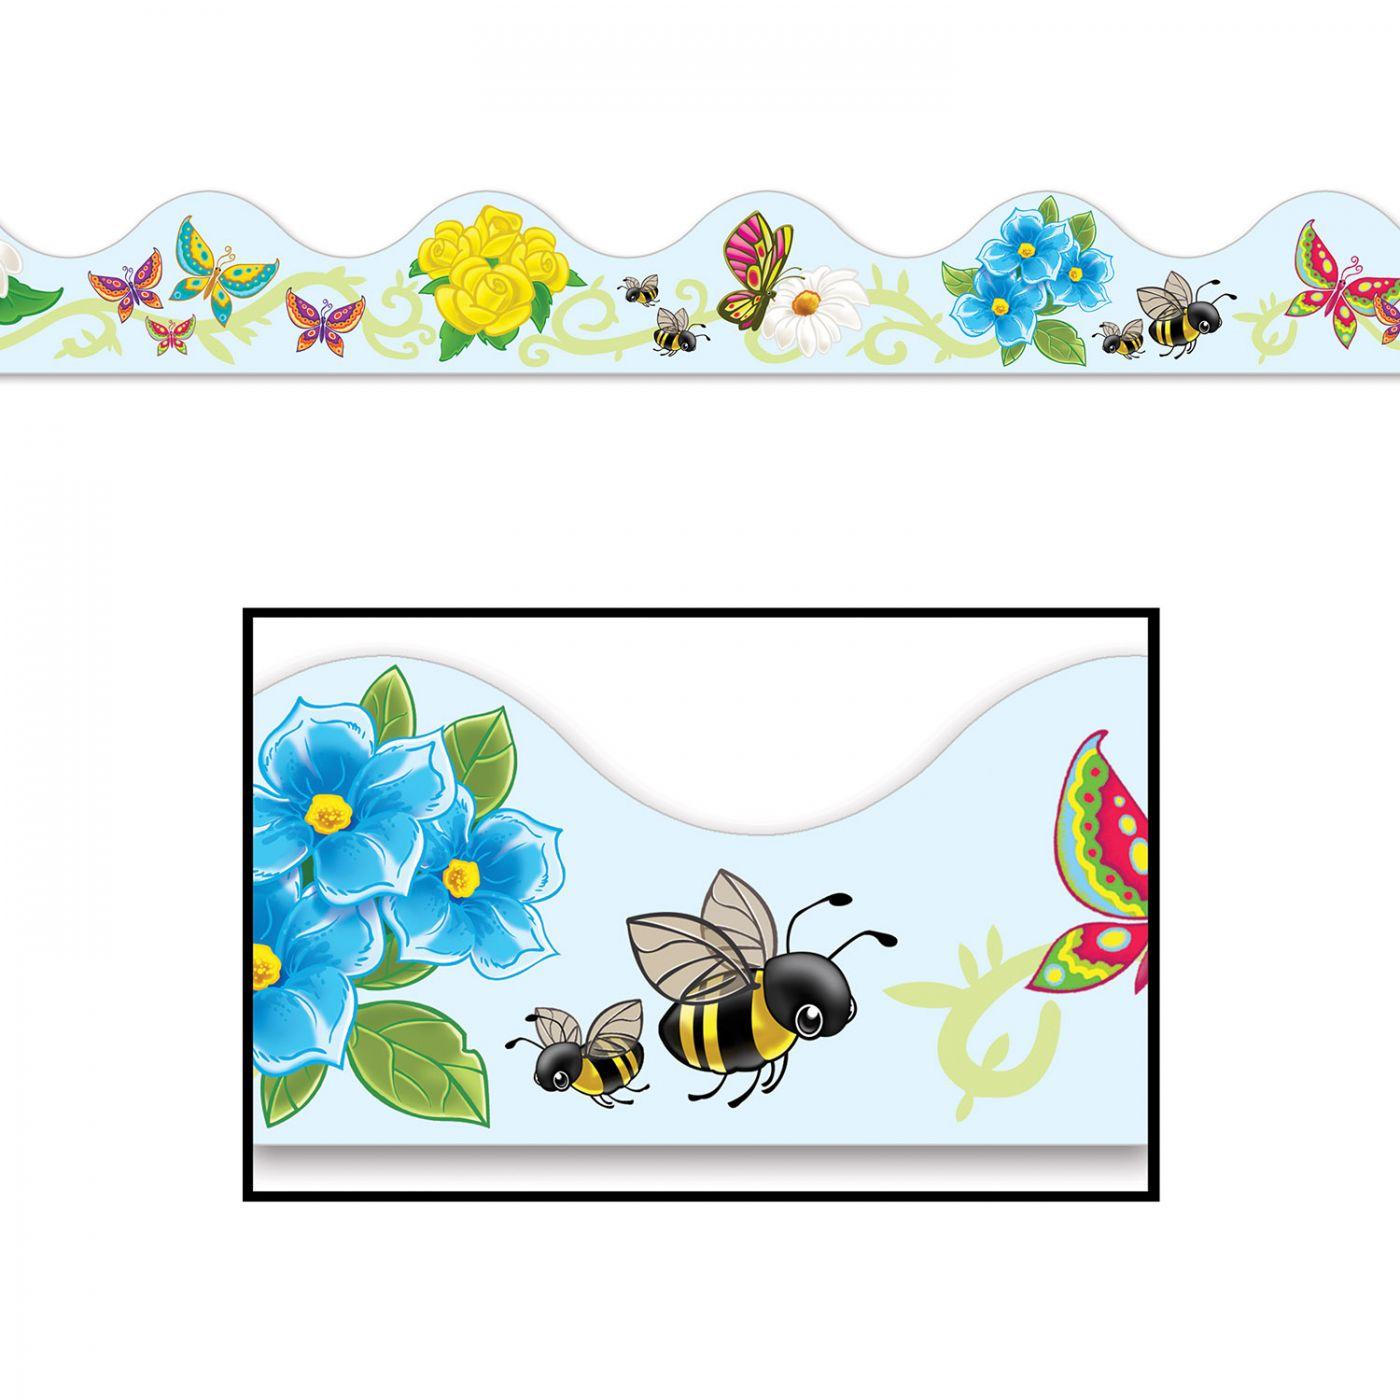 Butterflies & Flowers Border Trim image